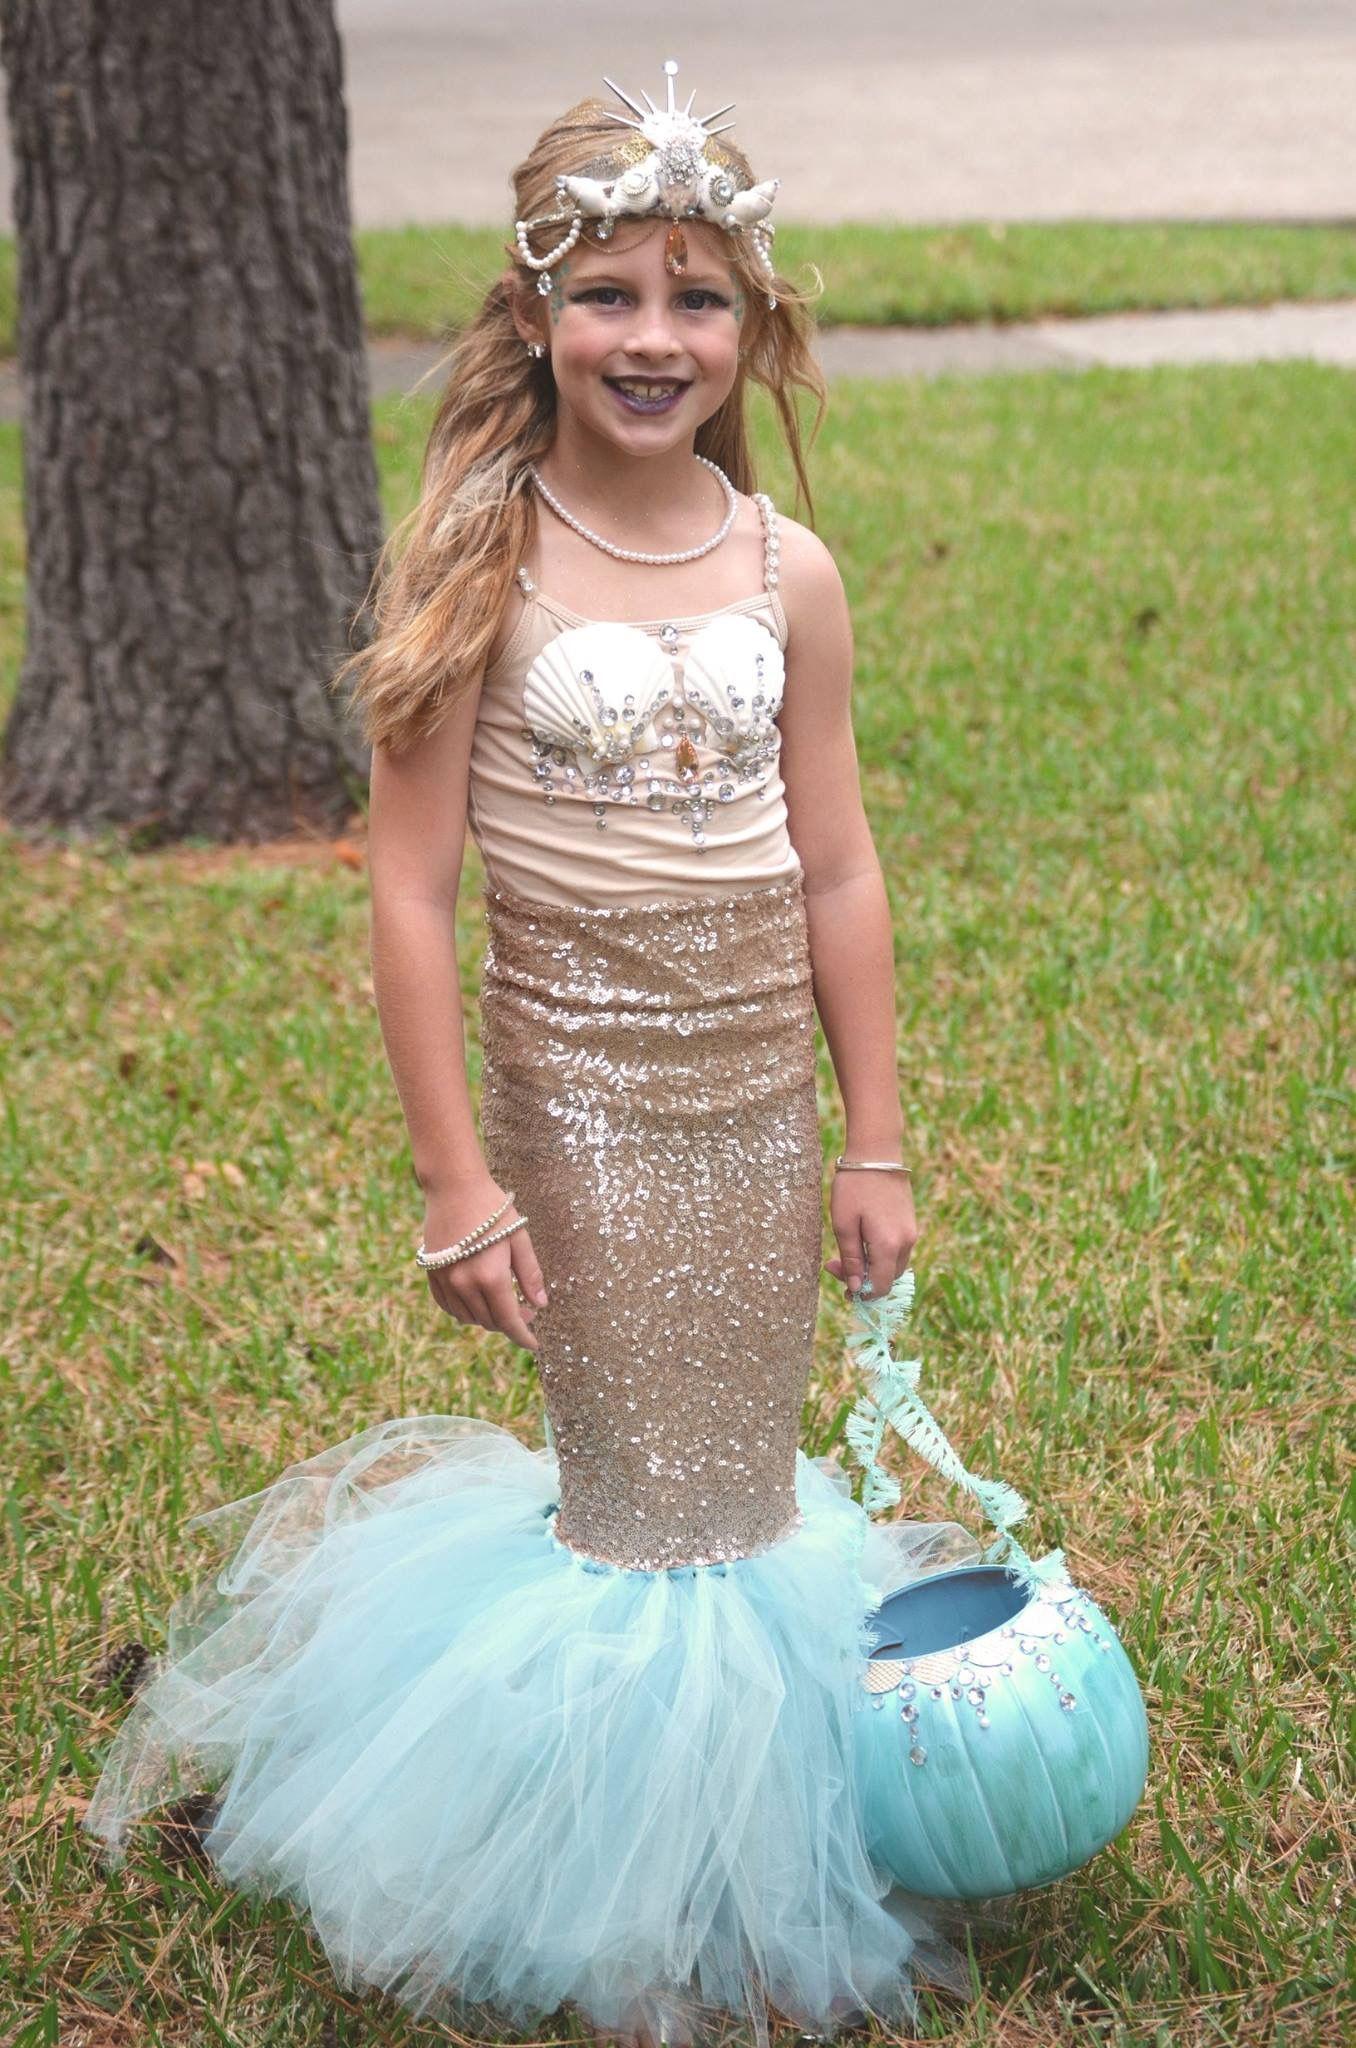 Diy mermaid costume childrens halloween costume mermaid crown diy mermaid costume childrens halloween costume mermaid crown mermaid skirt mermaid top solutioingenieria Choice Image